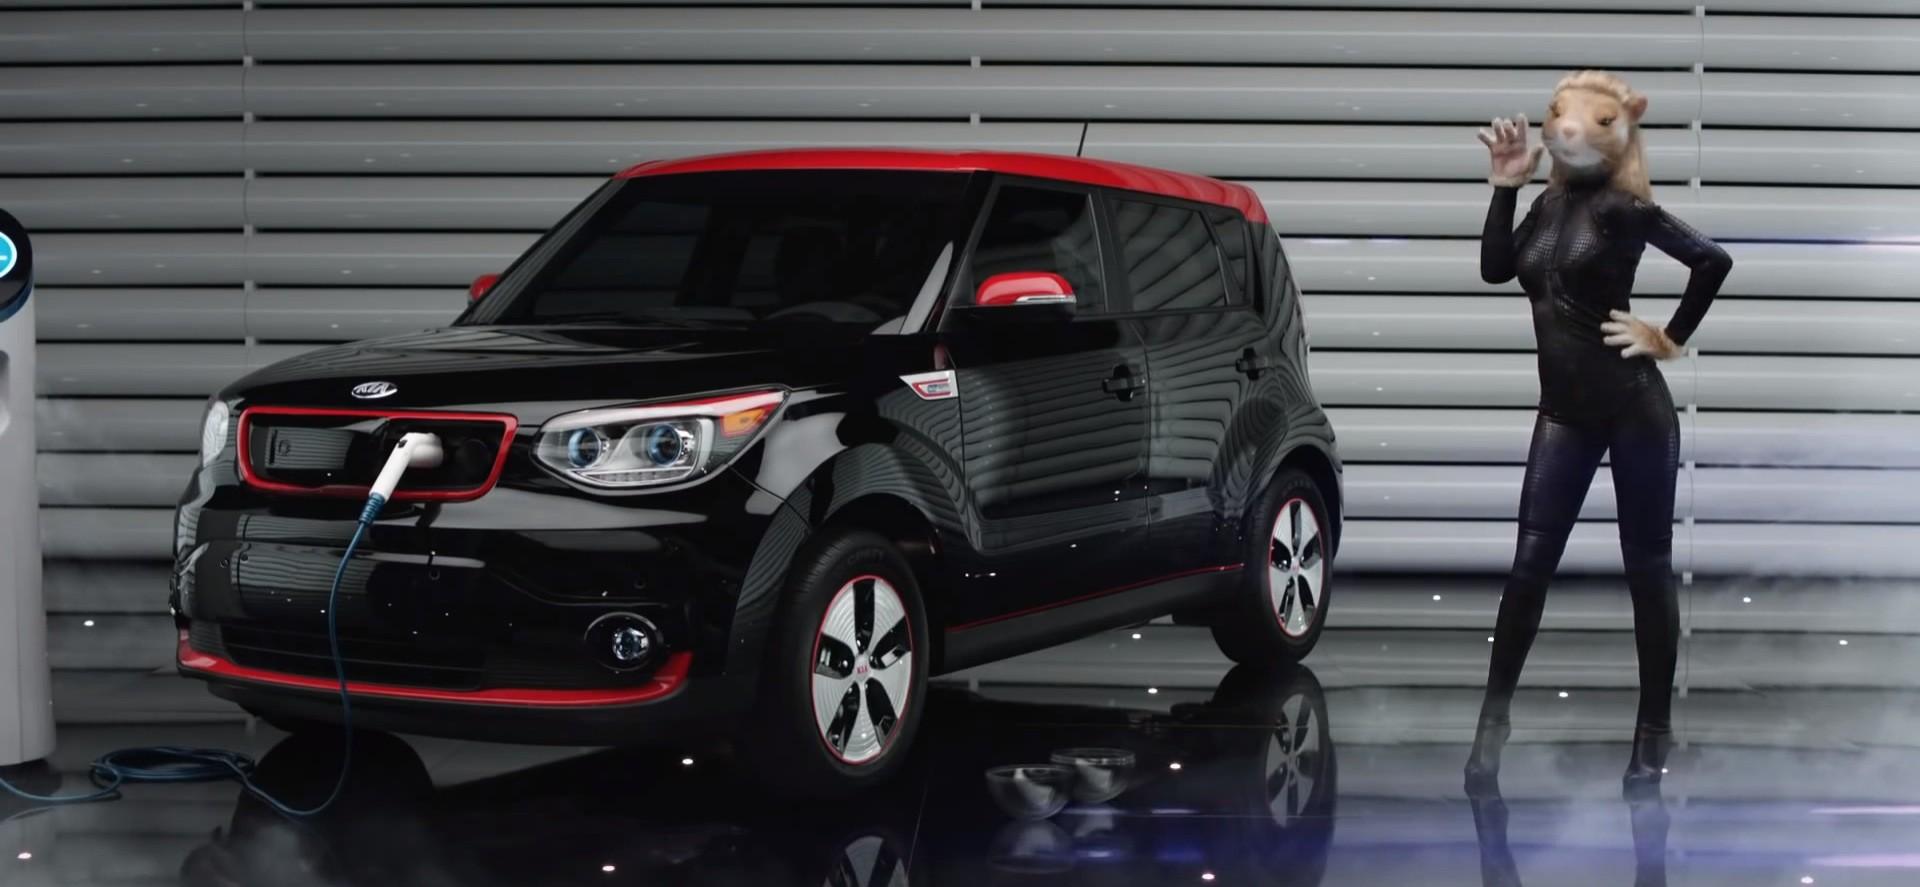 Kia Soul Commercial >> Kia Soul EV Gets its Furry Latex Freak on in Latest Hamster Commercial - autoevolution